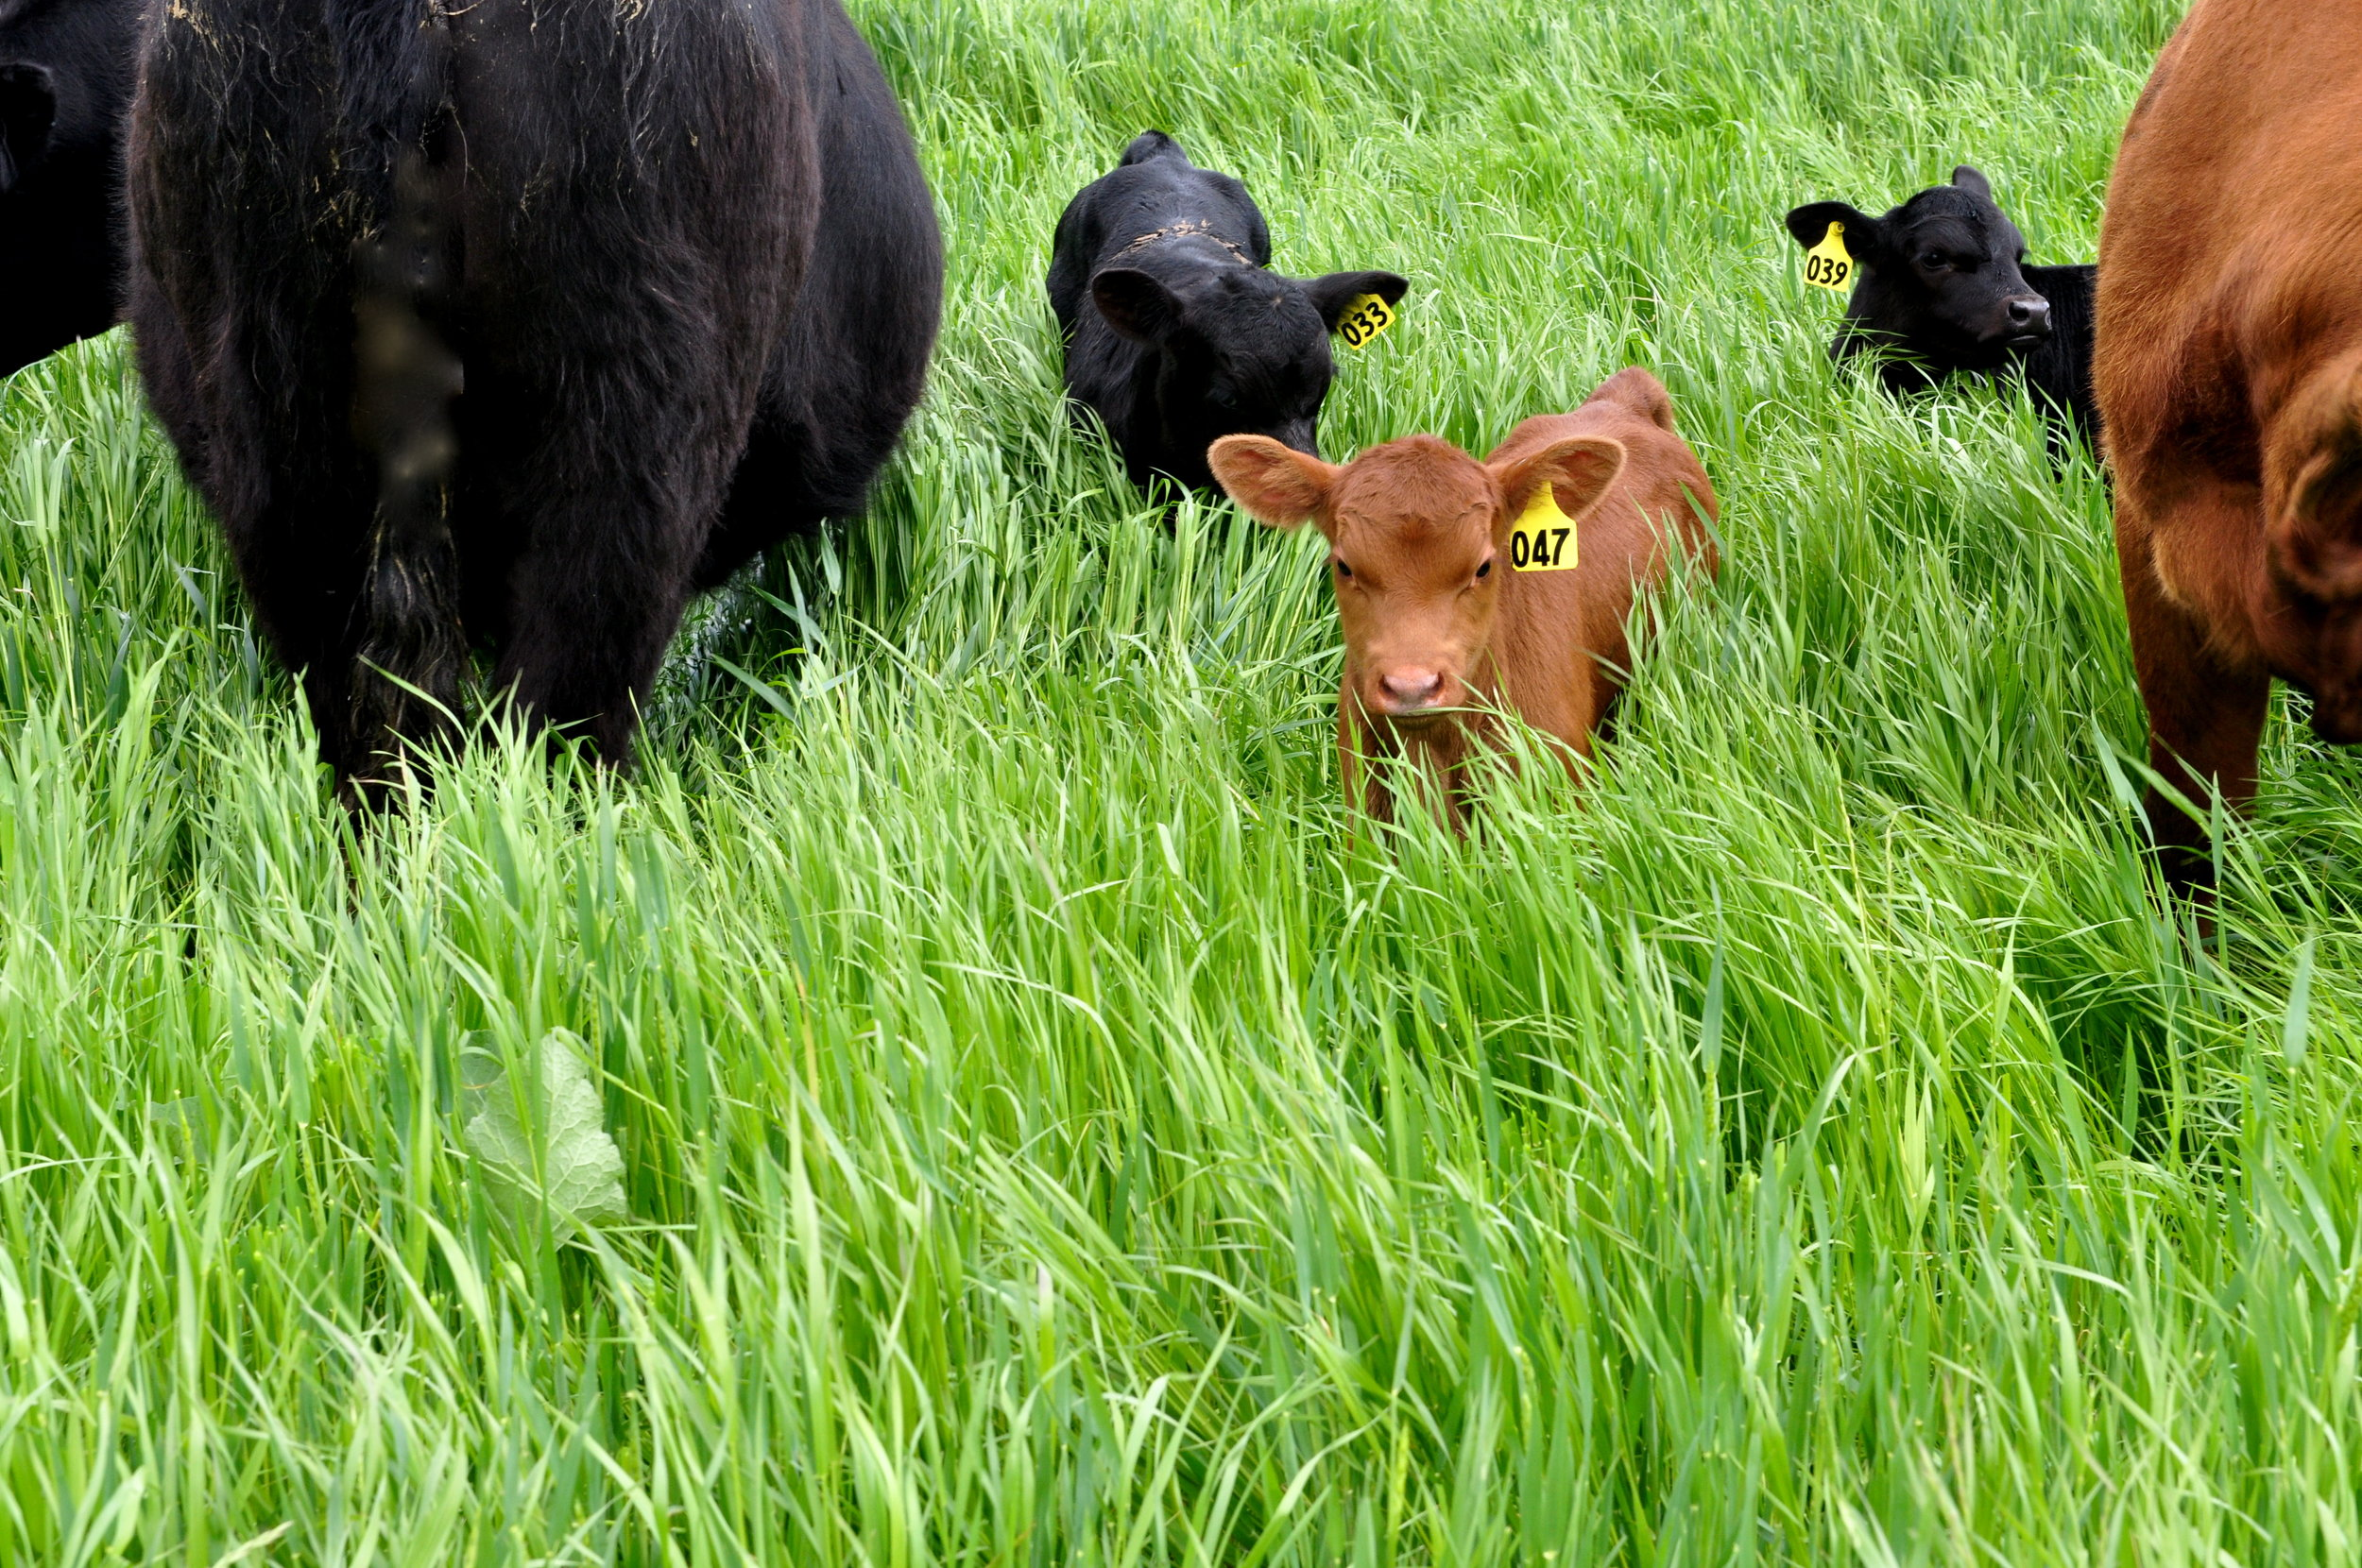 George Lake - calves in grass.JPG